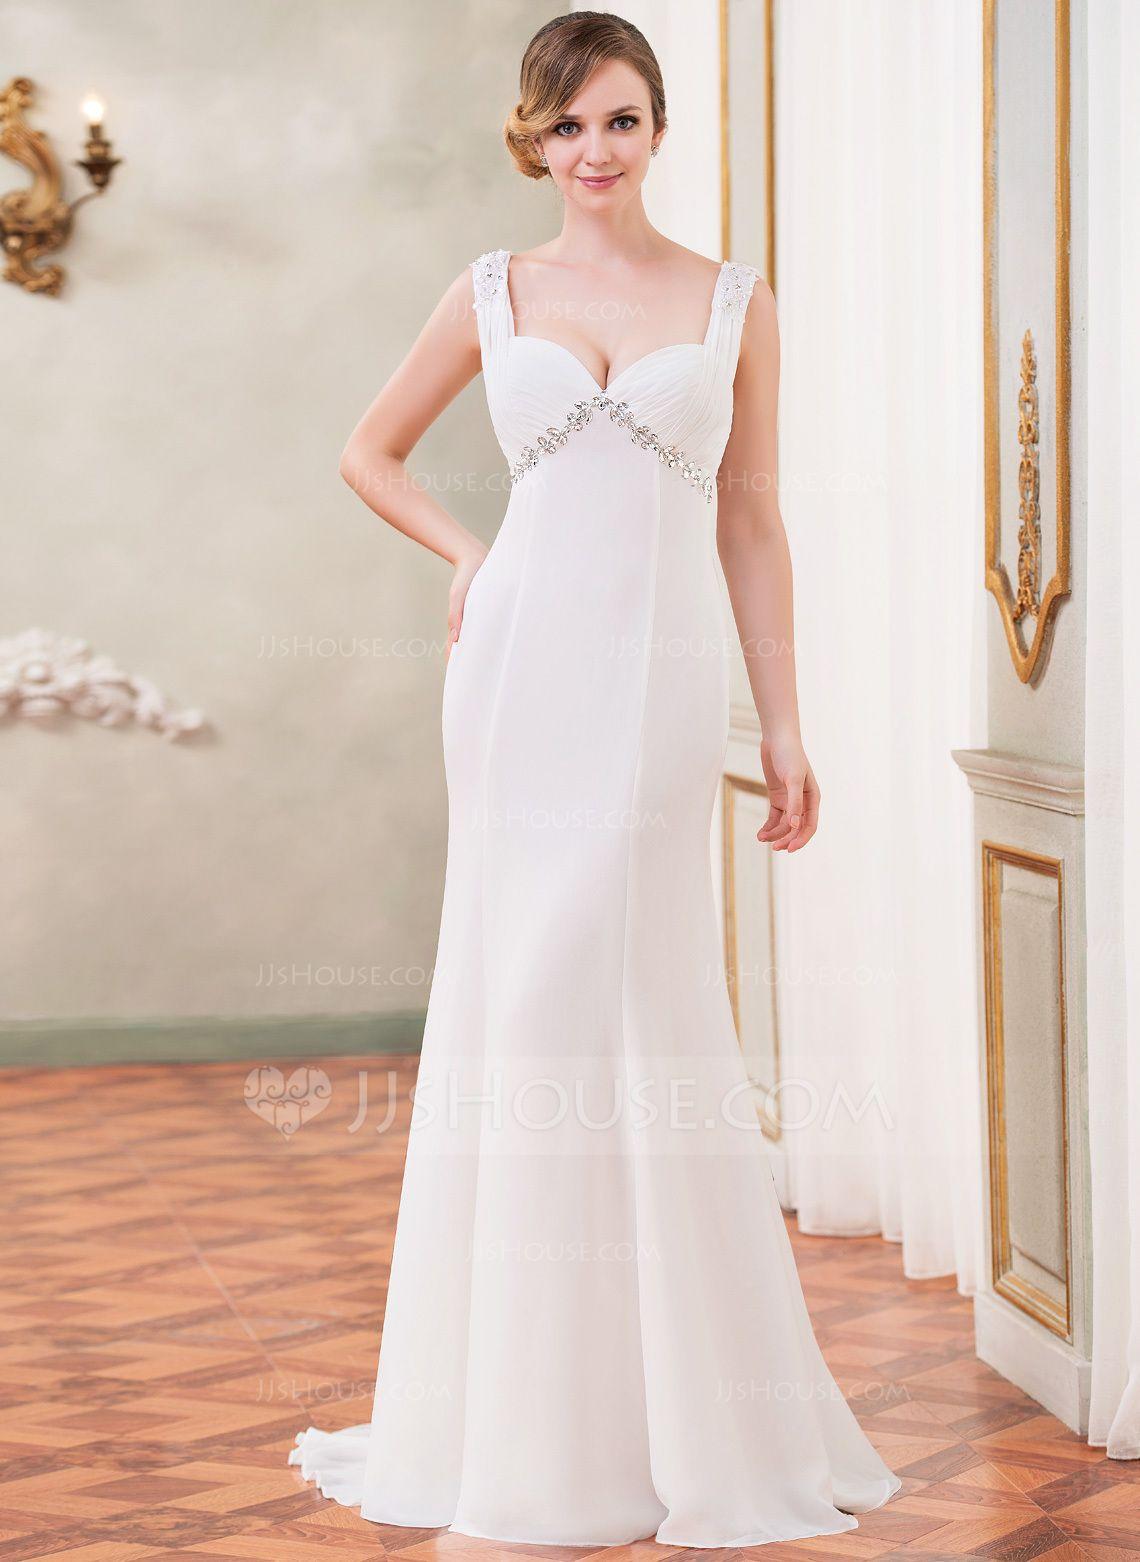 Mermaid ruffle wedding dress  TrumpetMermaid Sweetheart Watteau Train Chiffon Wedding Dress With